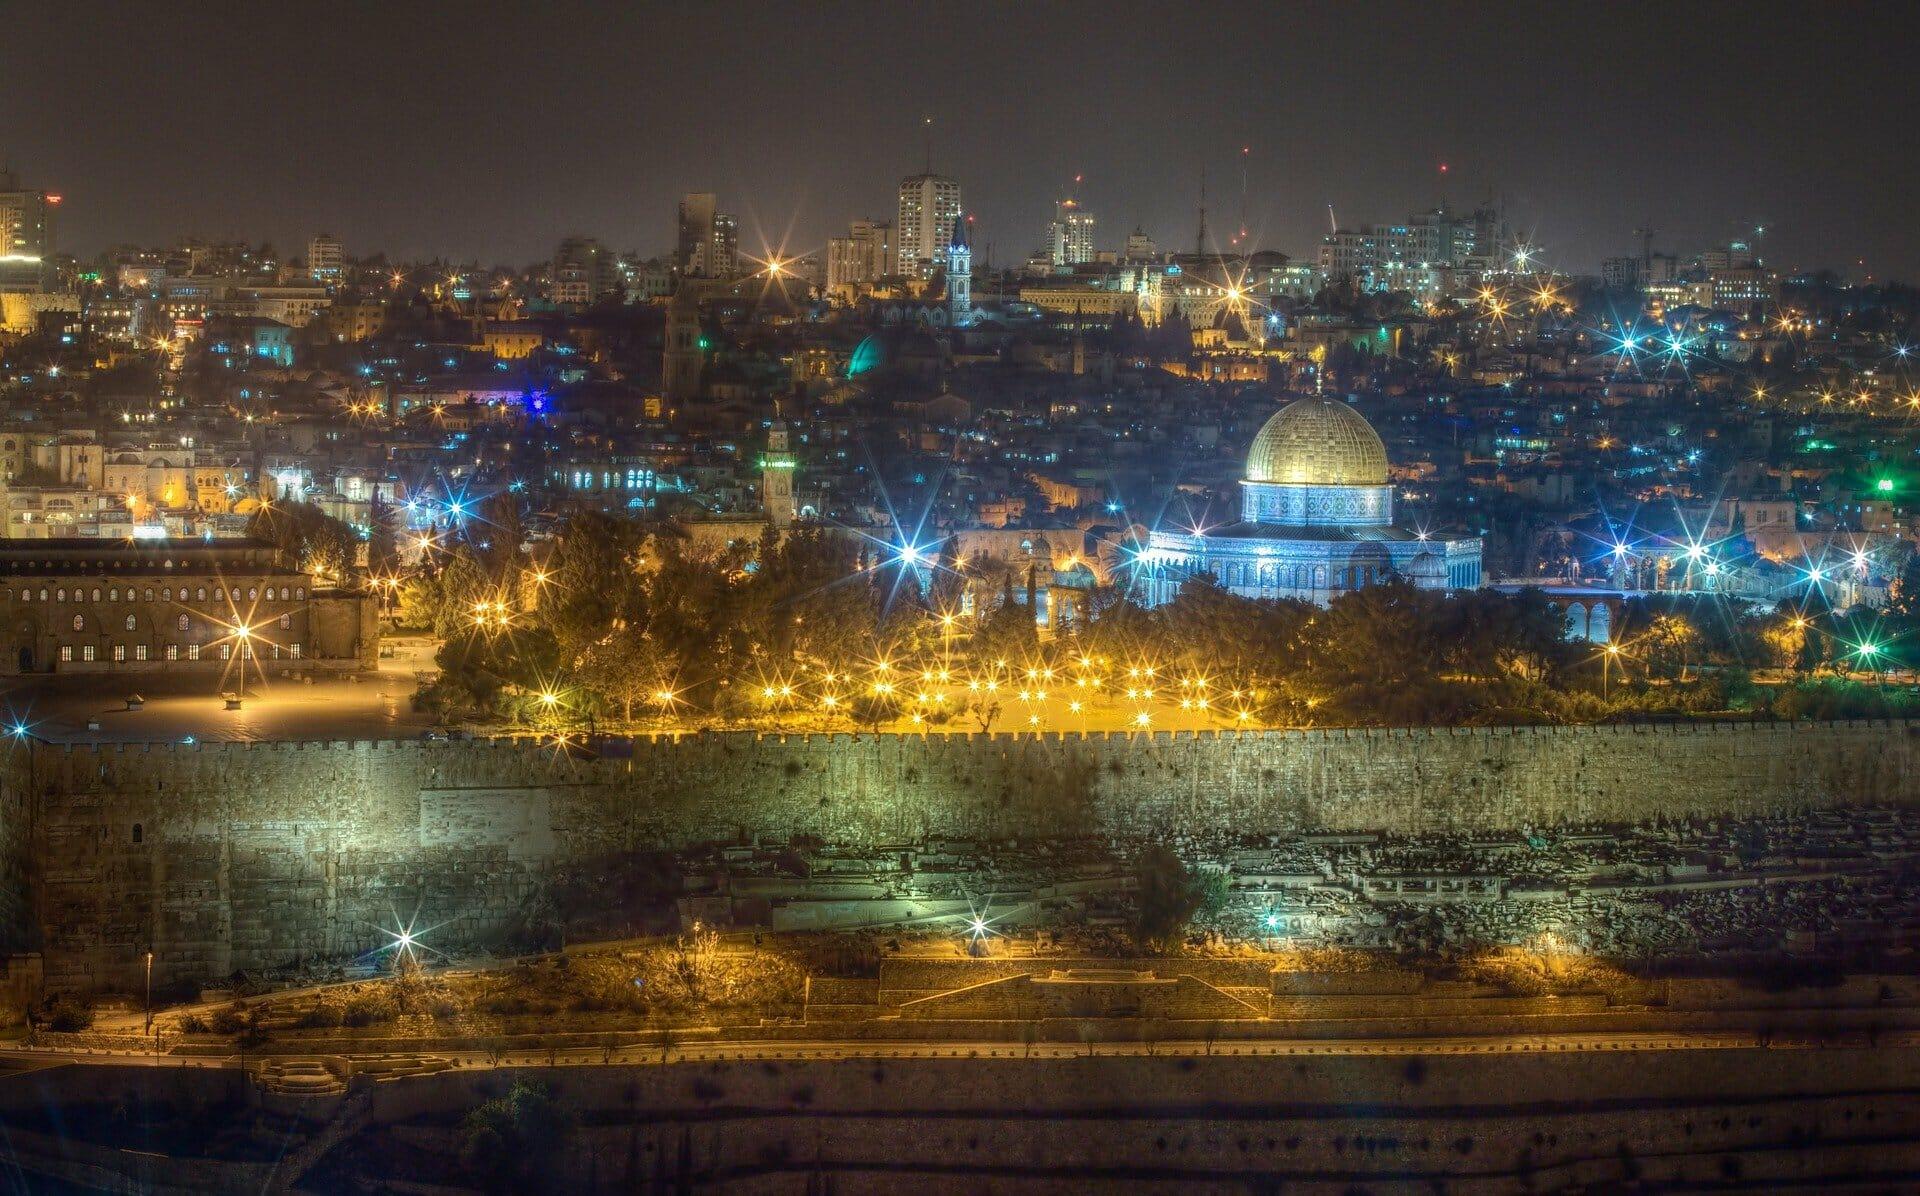 historic sites in Jerusalem - Tower of David at night